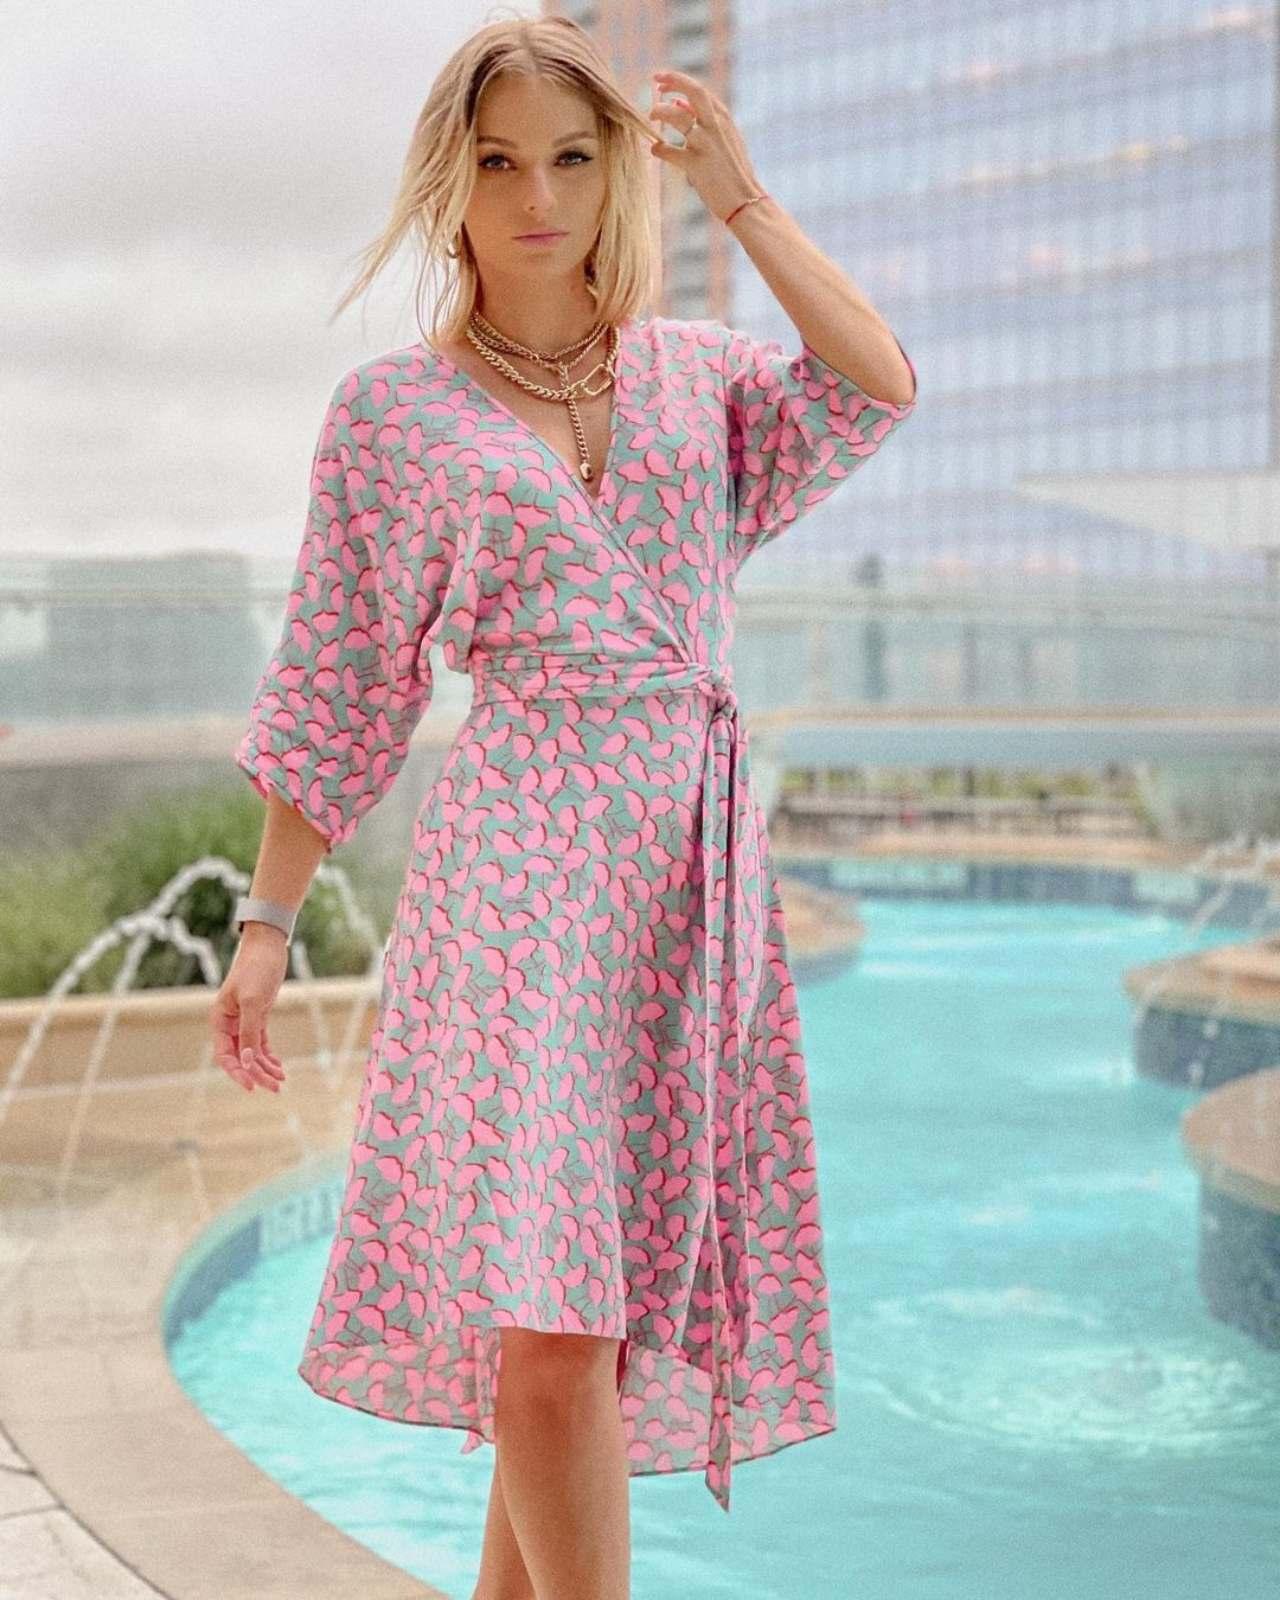 irina baeva con vestido rosa con gris